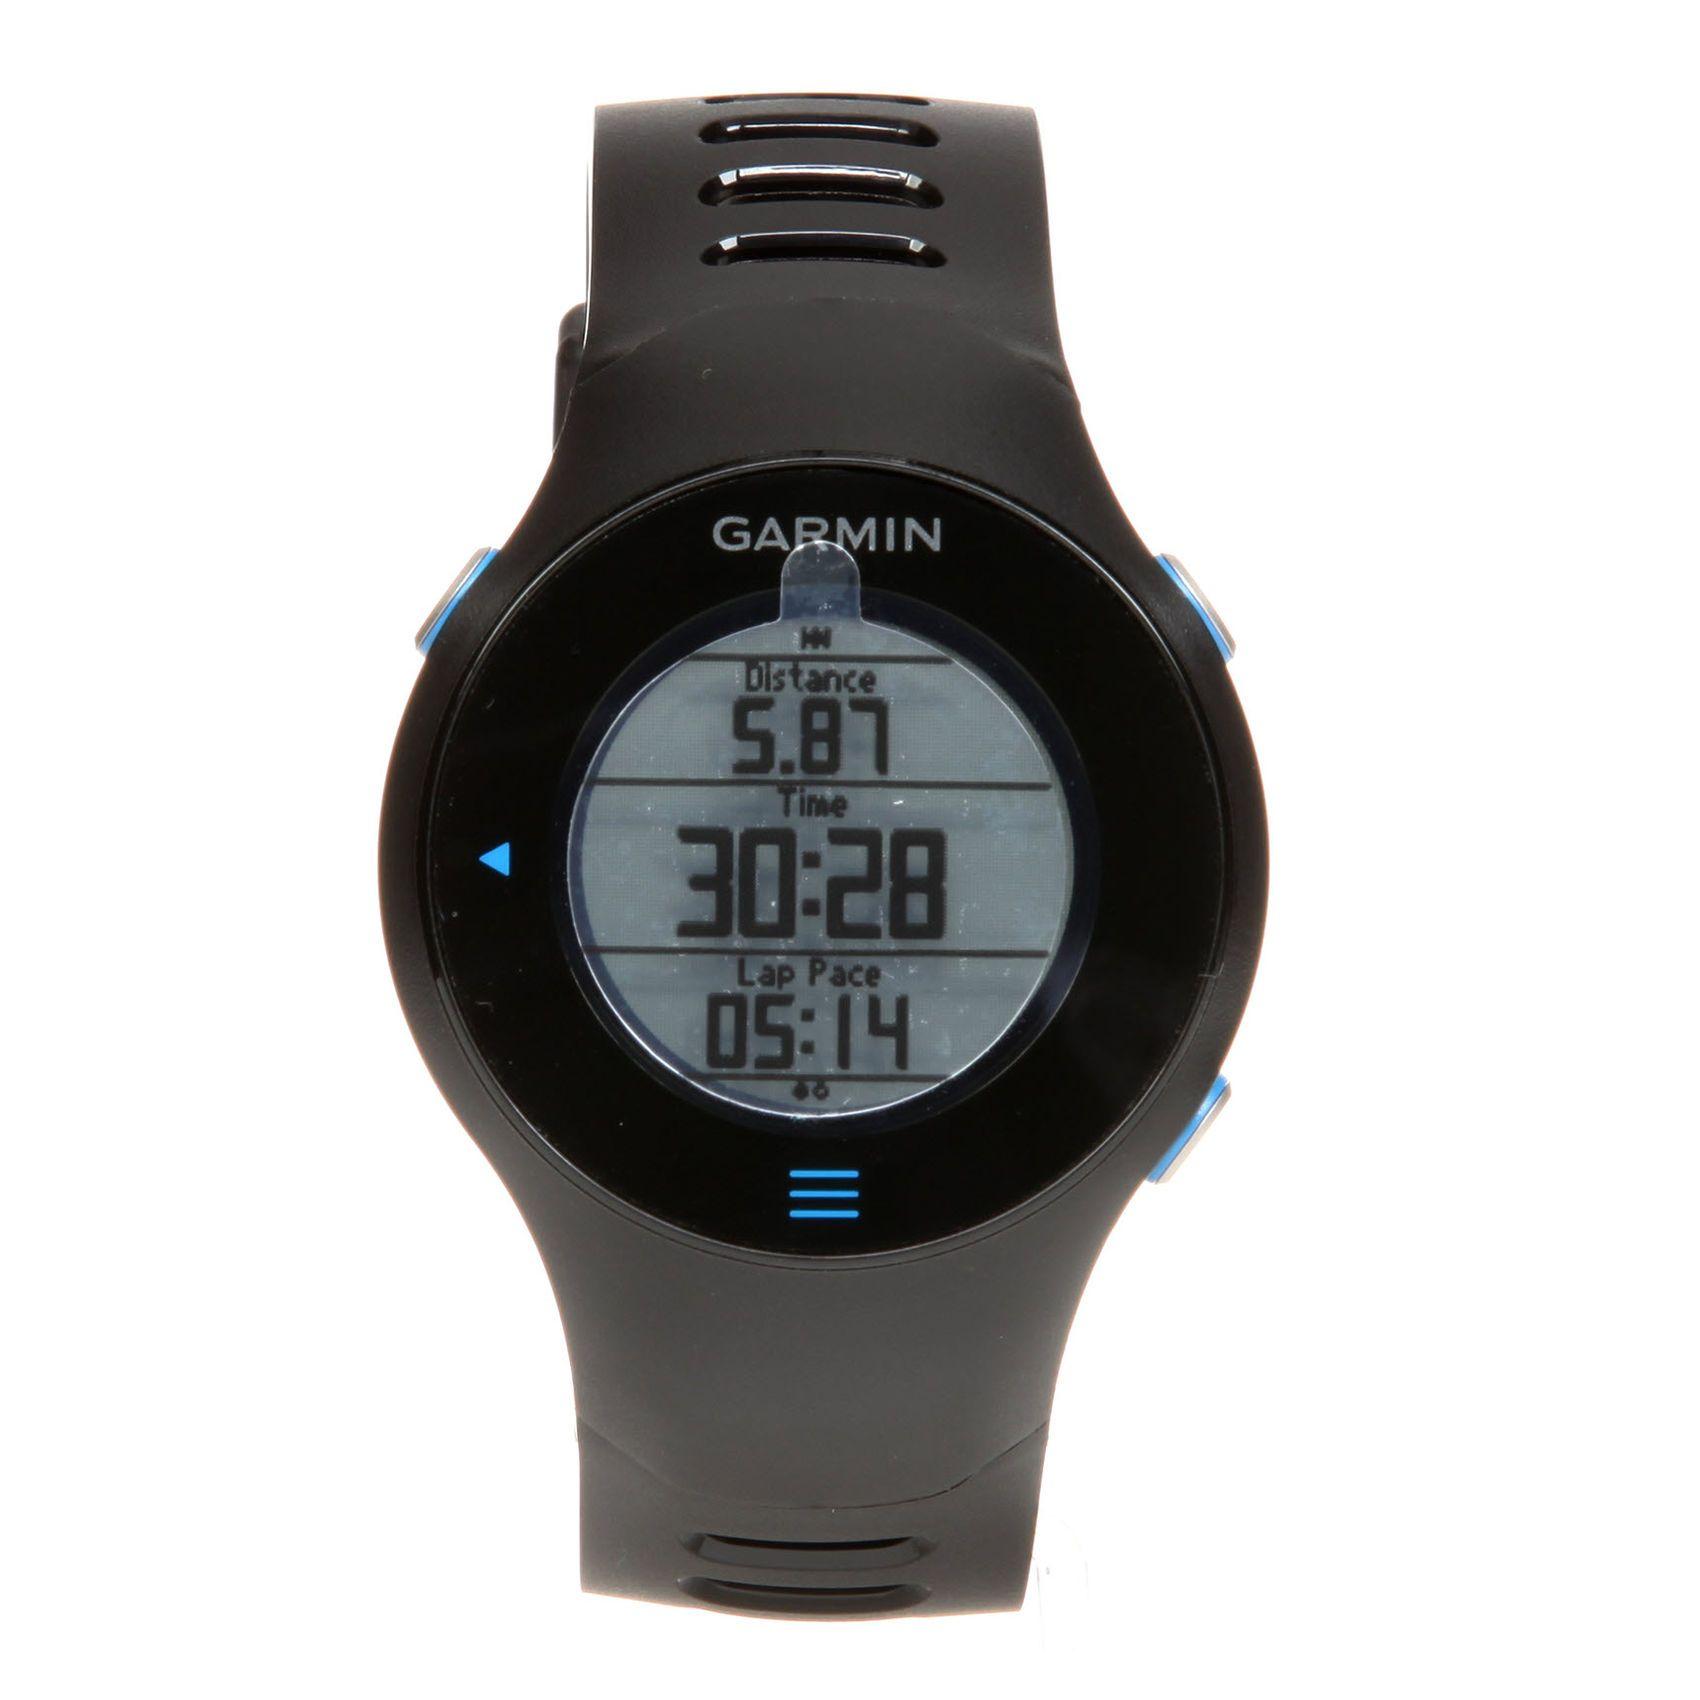 Garmin Forerunner 610 Gps sports watch, Garmin